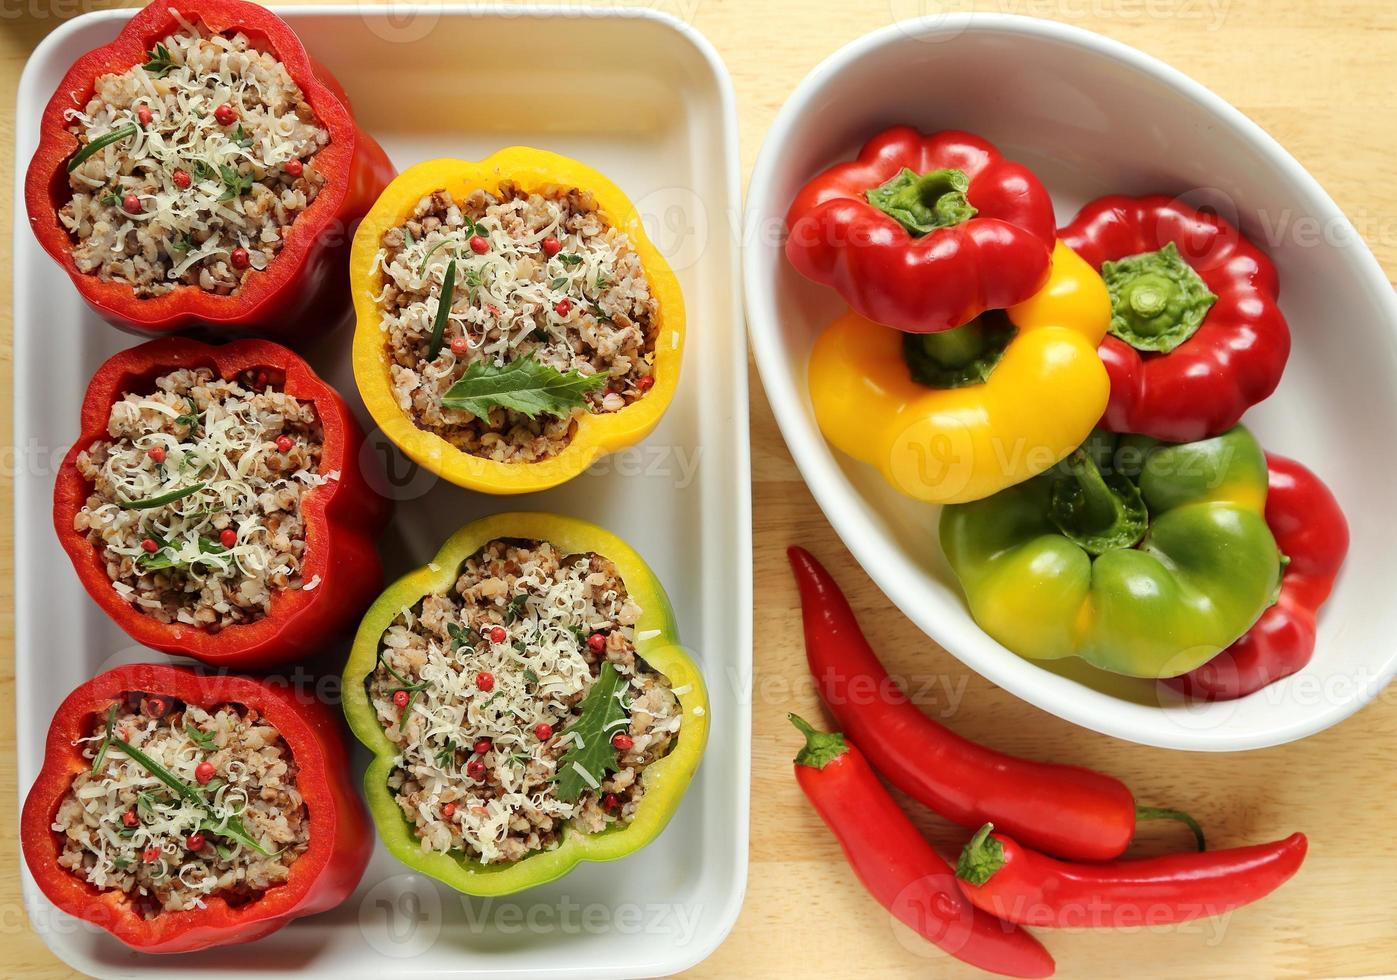 Stuffed peppers photo